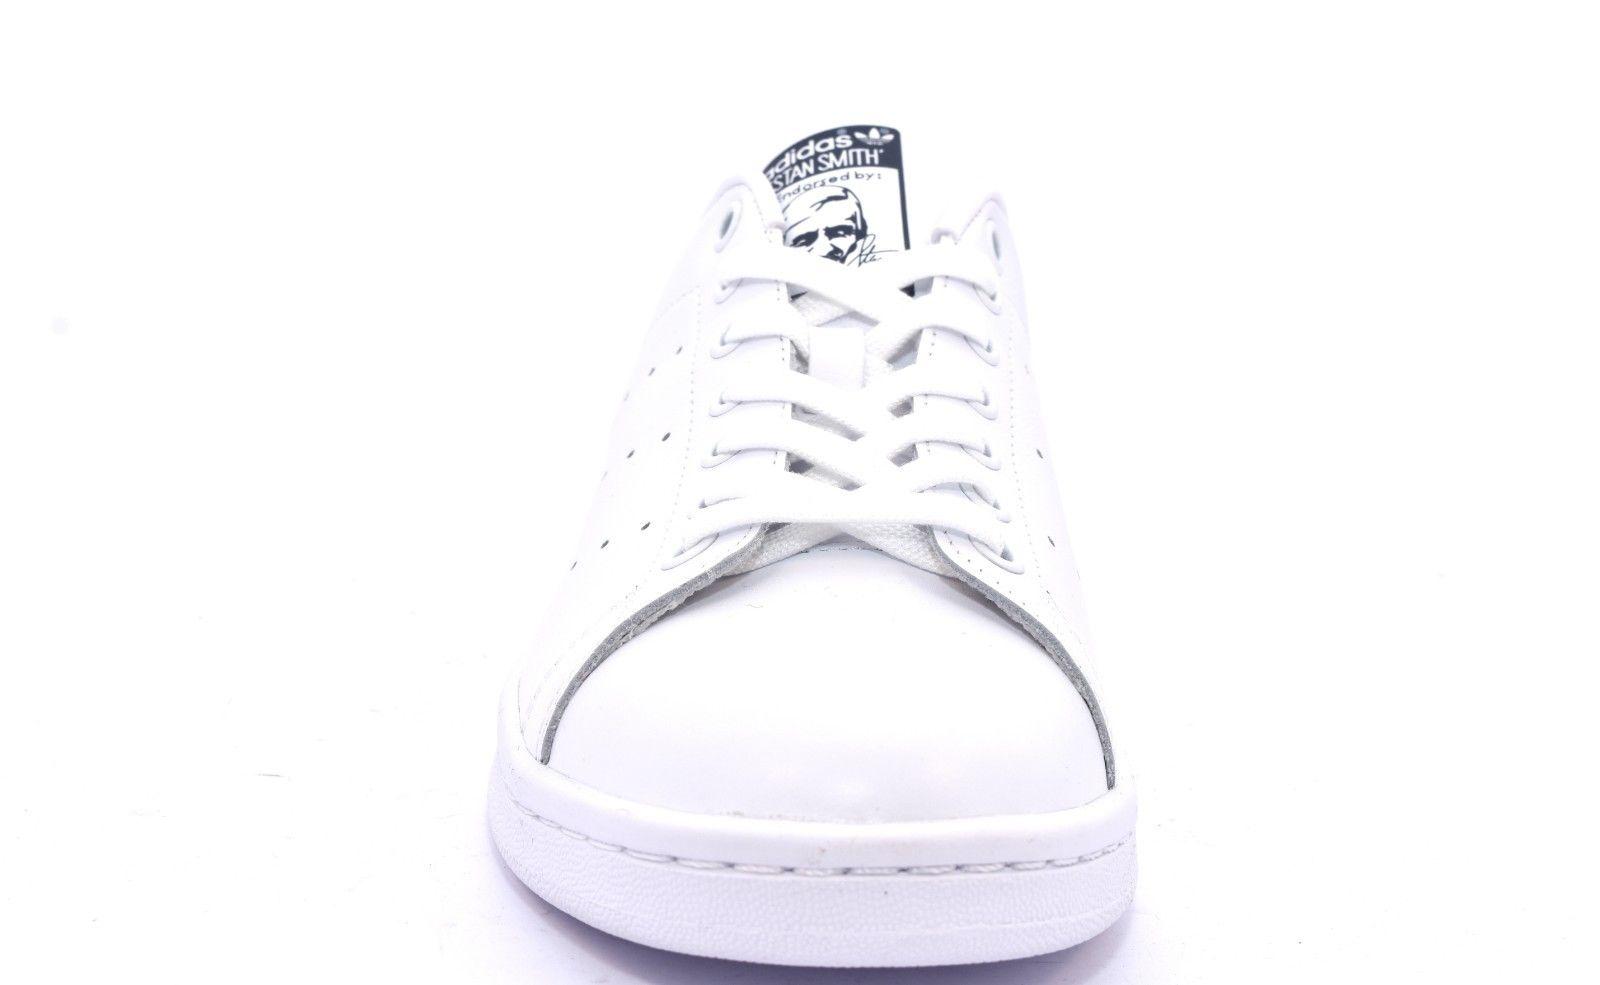 new arrivals 4aaf5 f177c ADIDAS-STAN-SMITH-M20325-BIANCO-BLU-Sneakers-Scarpe-Ginnastica-Originals- Uomo-273538590208-3